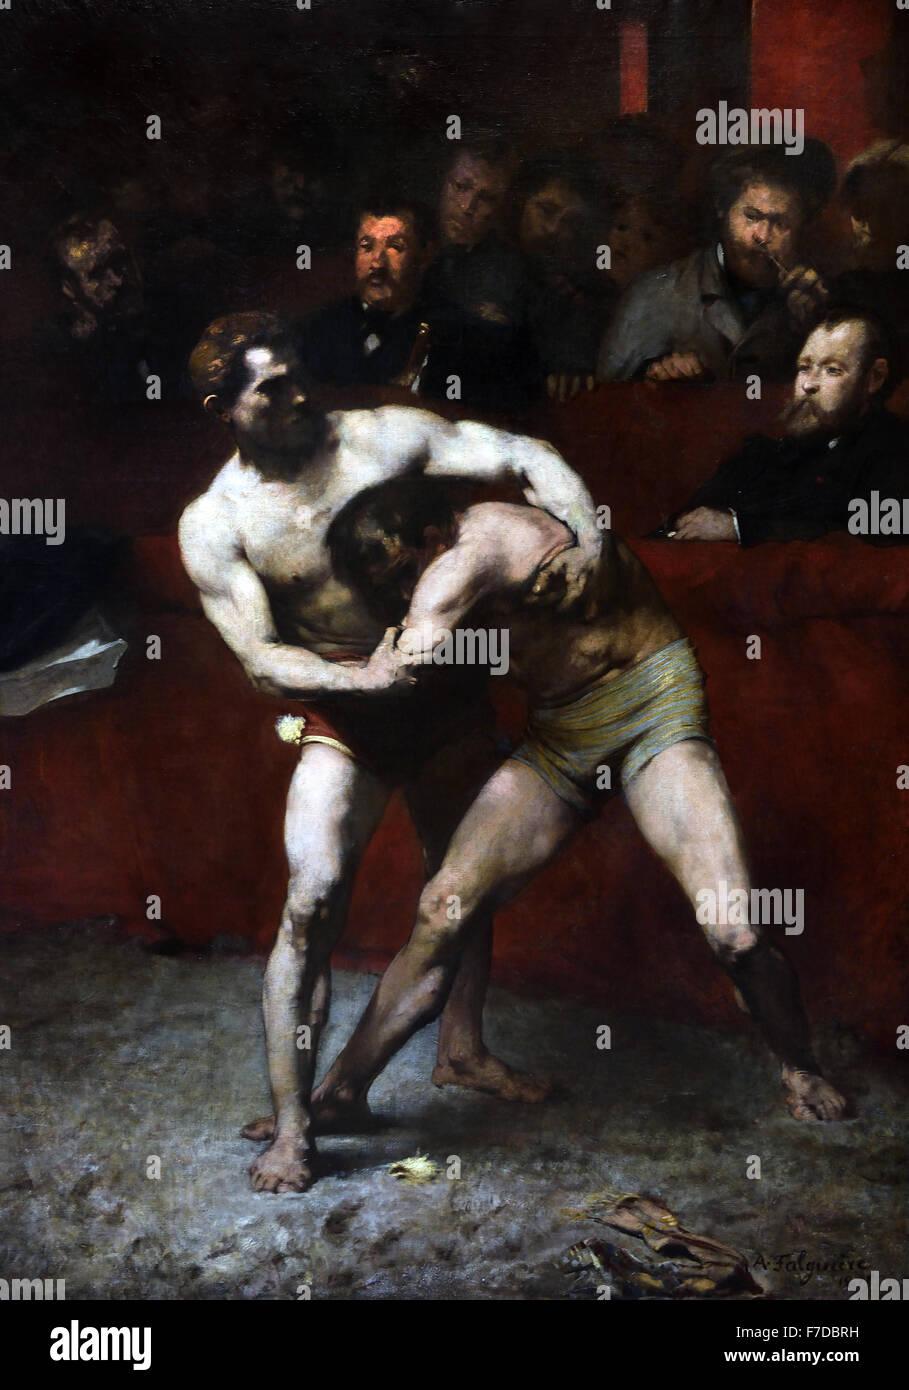 Lutteurs - Wrestlers 1875 Alexandre Falguière 1831 - 1900  France French - Stock Image